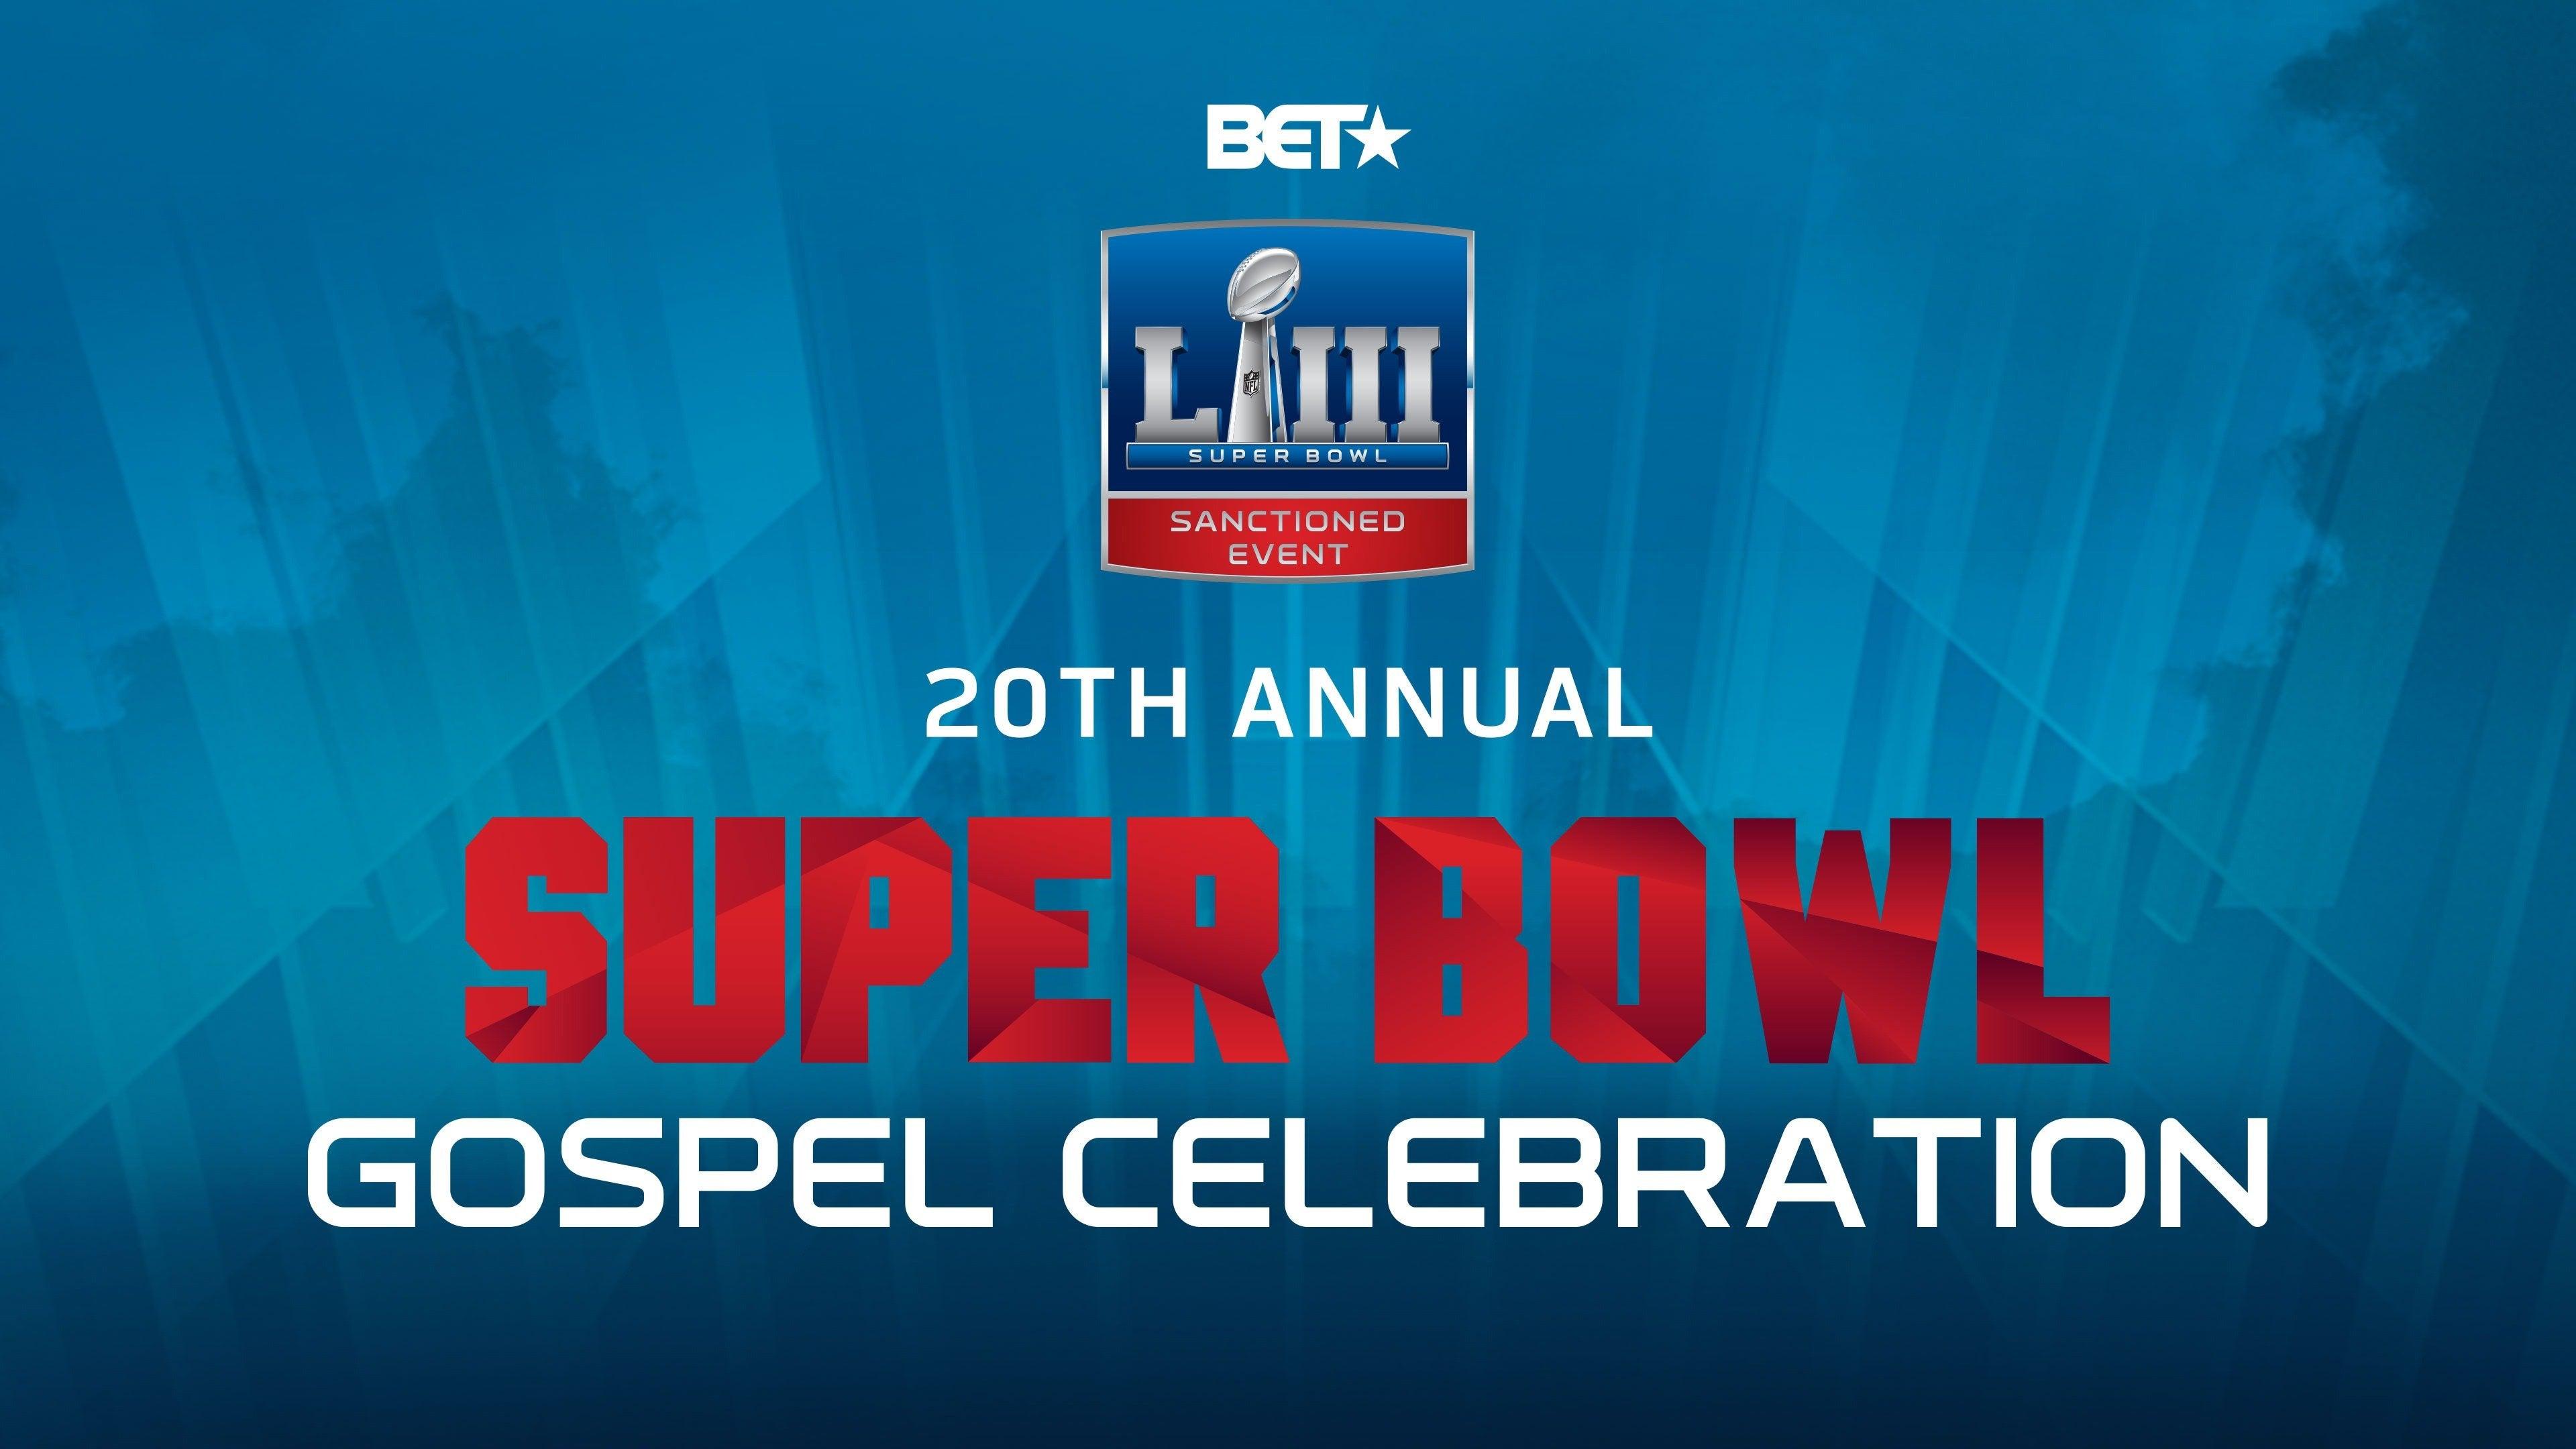 The 20th Annual Super Bowl Gospel Celebration 2019